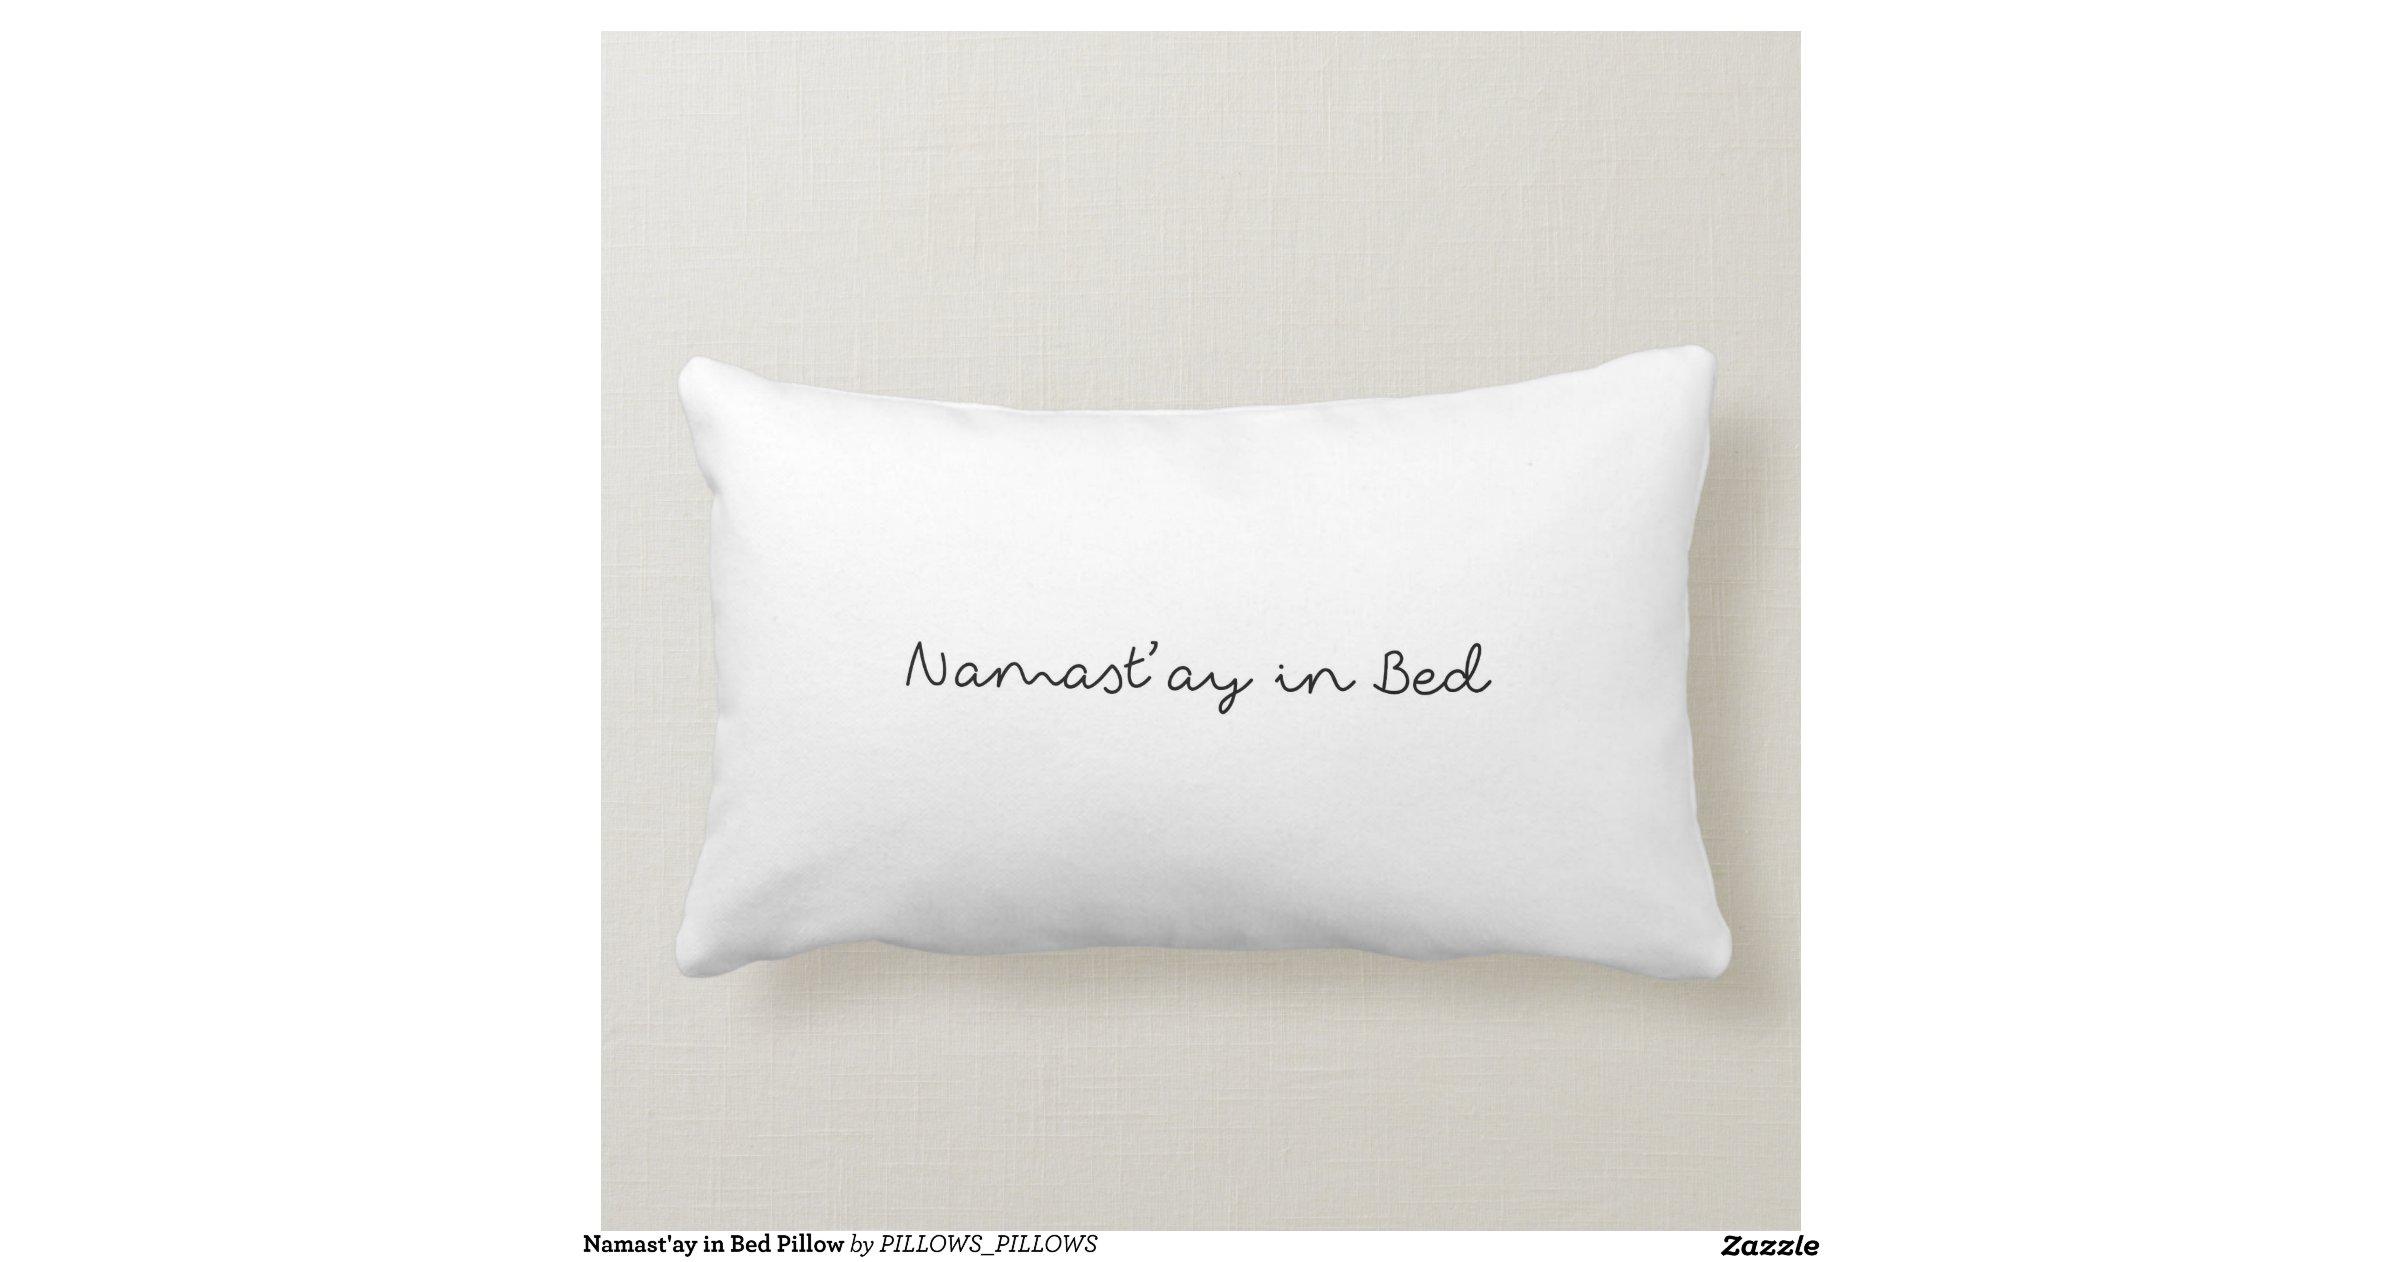 namastay in bed pillow r5fdf5112e5e8452191b21db33688aca3 i5fbw 8byvr. Black Bedroom Furniture Sets. Home Design Ideas